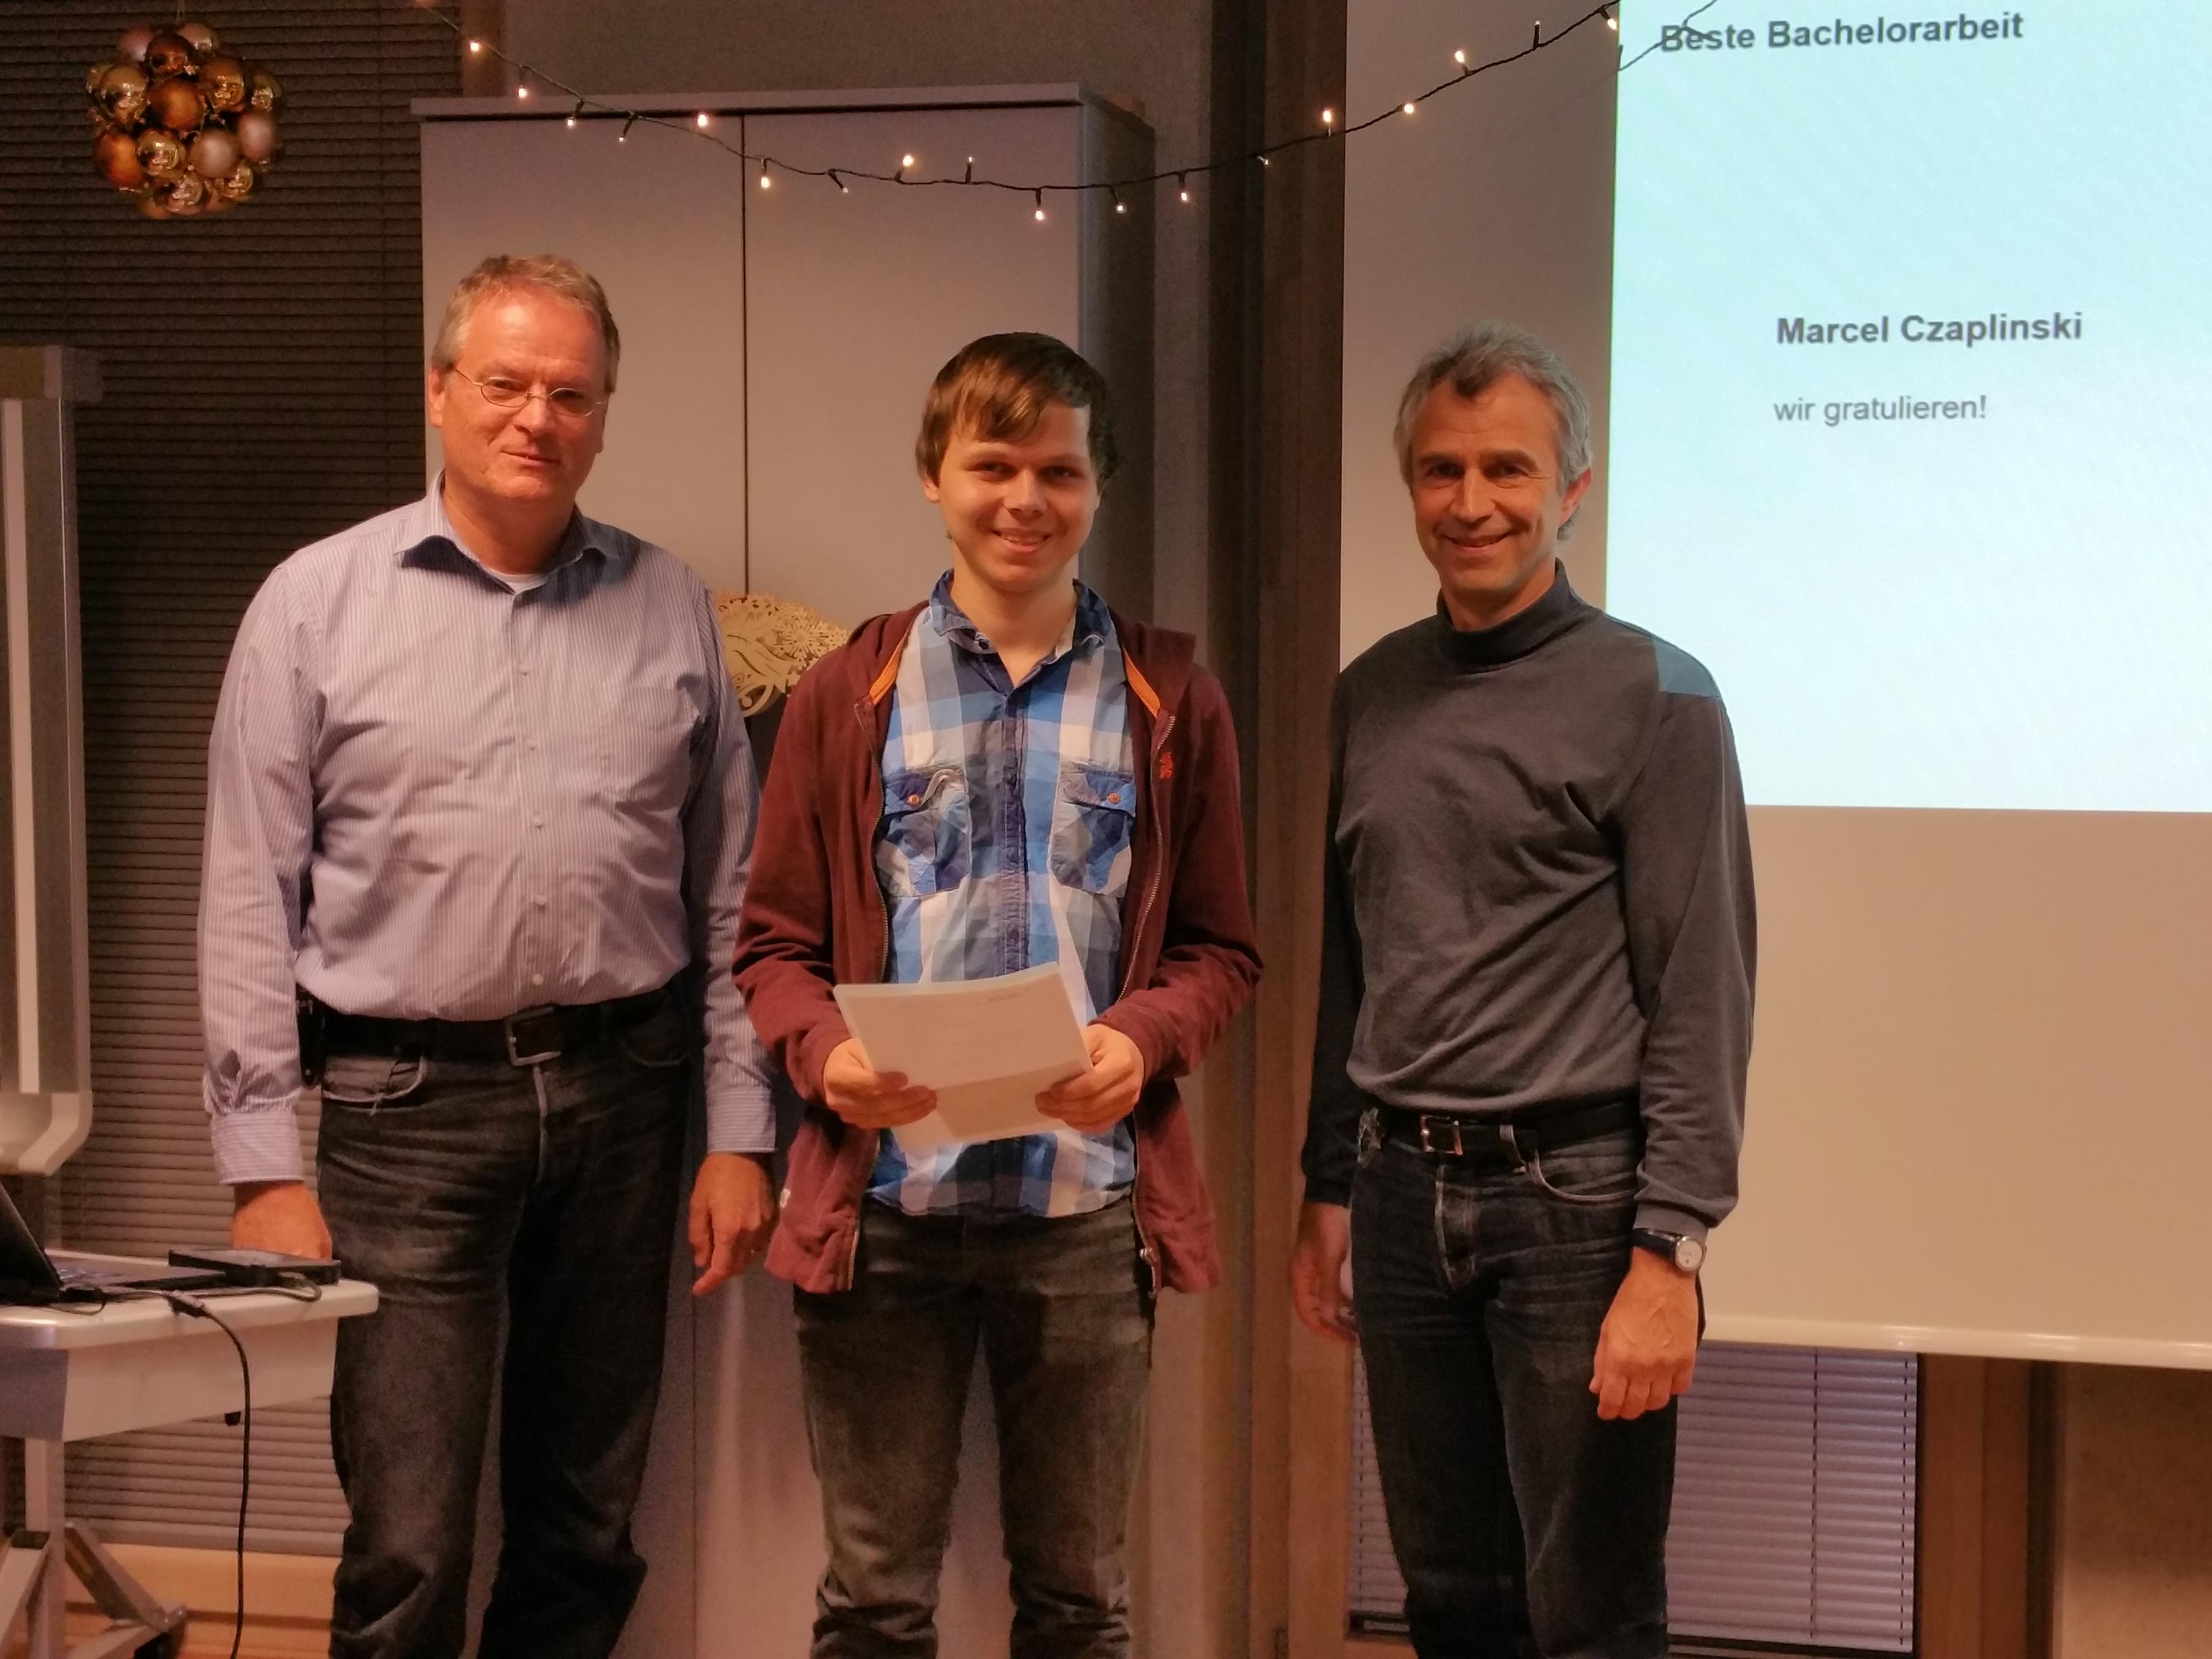 Preisträger beste Bachelorarbeit Marcel Czaplinski